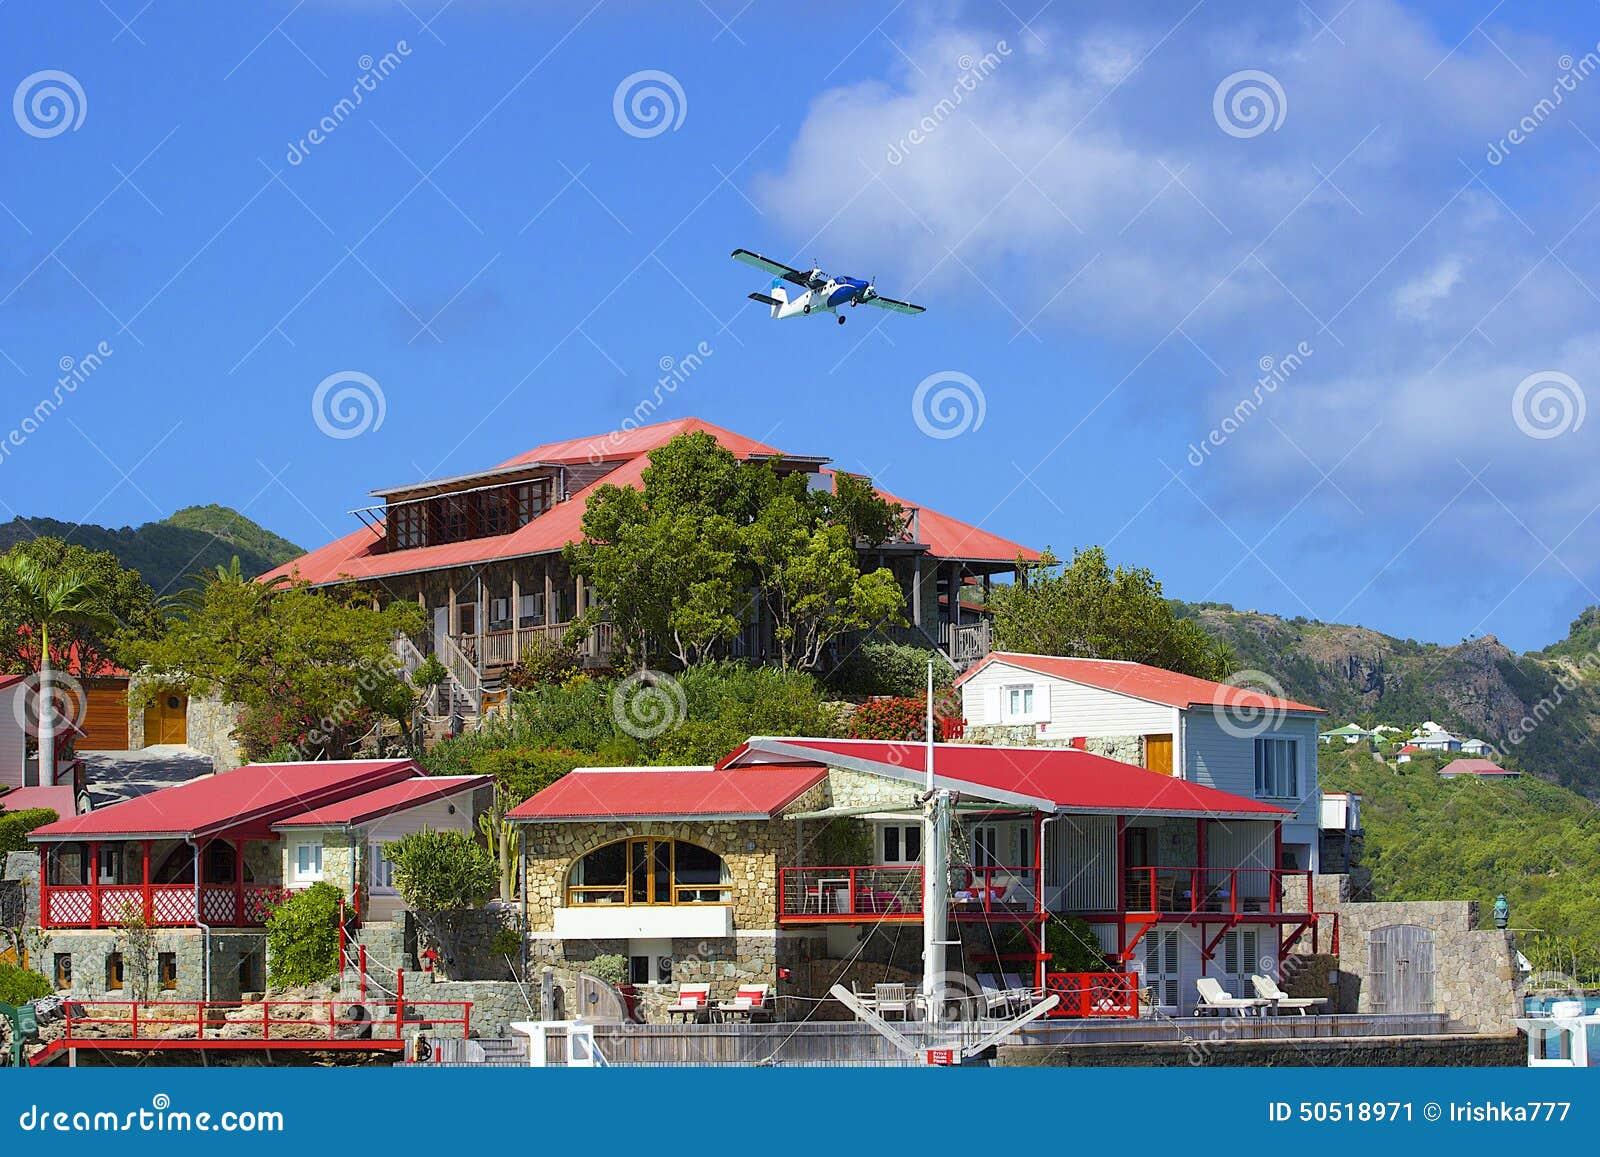 Plane and Eden Rock hotel in St Barths, Caribbean